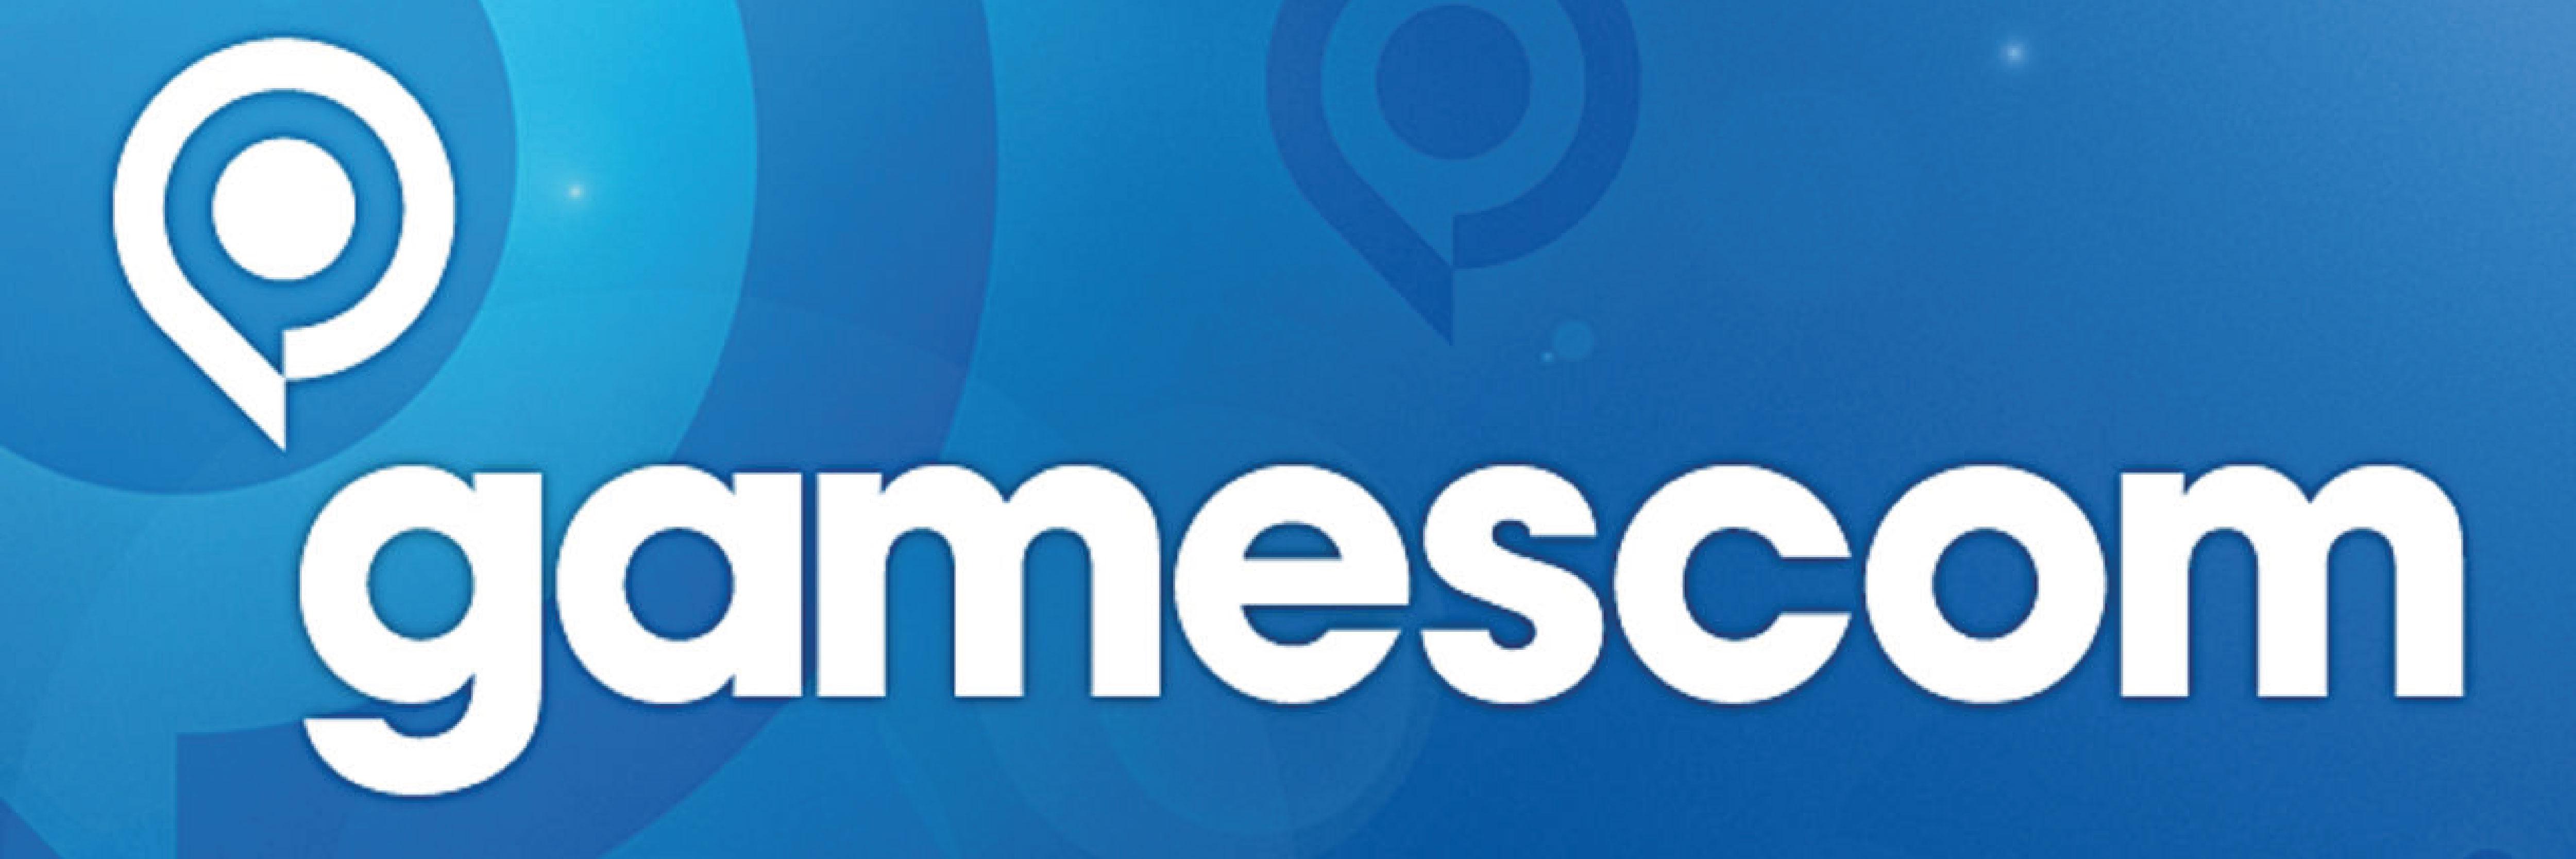 matchmaking 365 gamescom